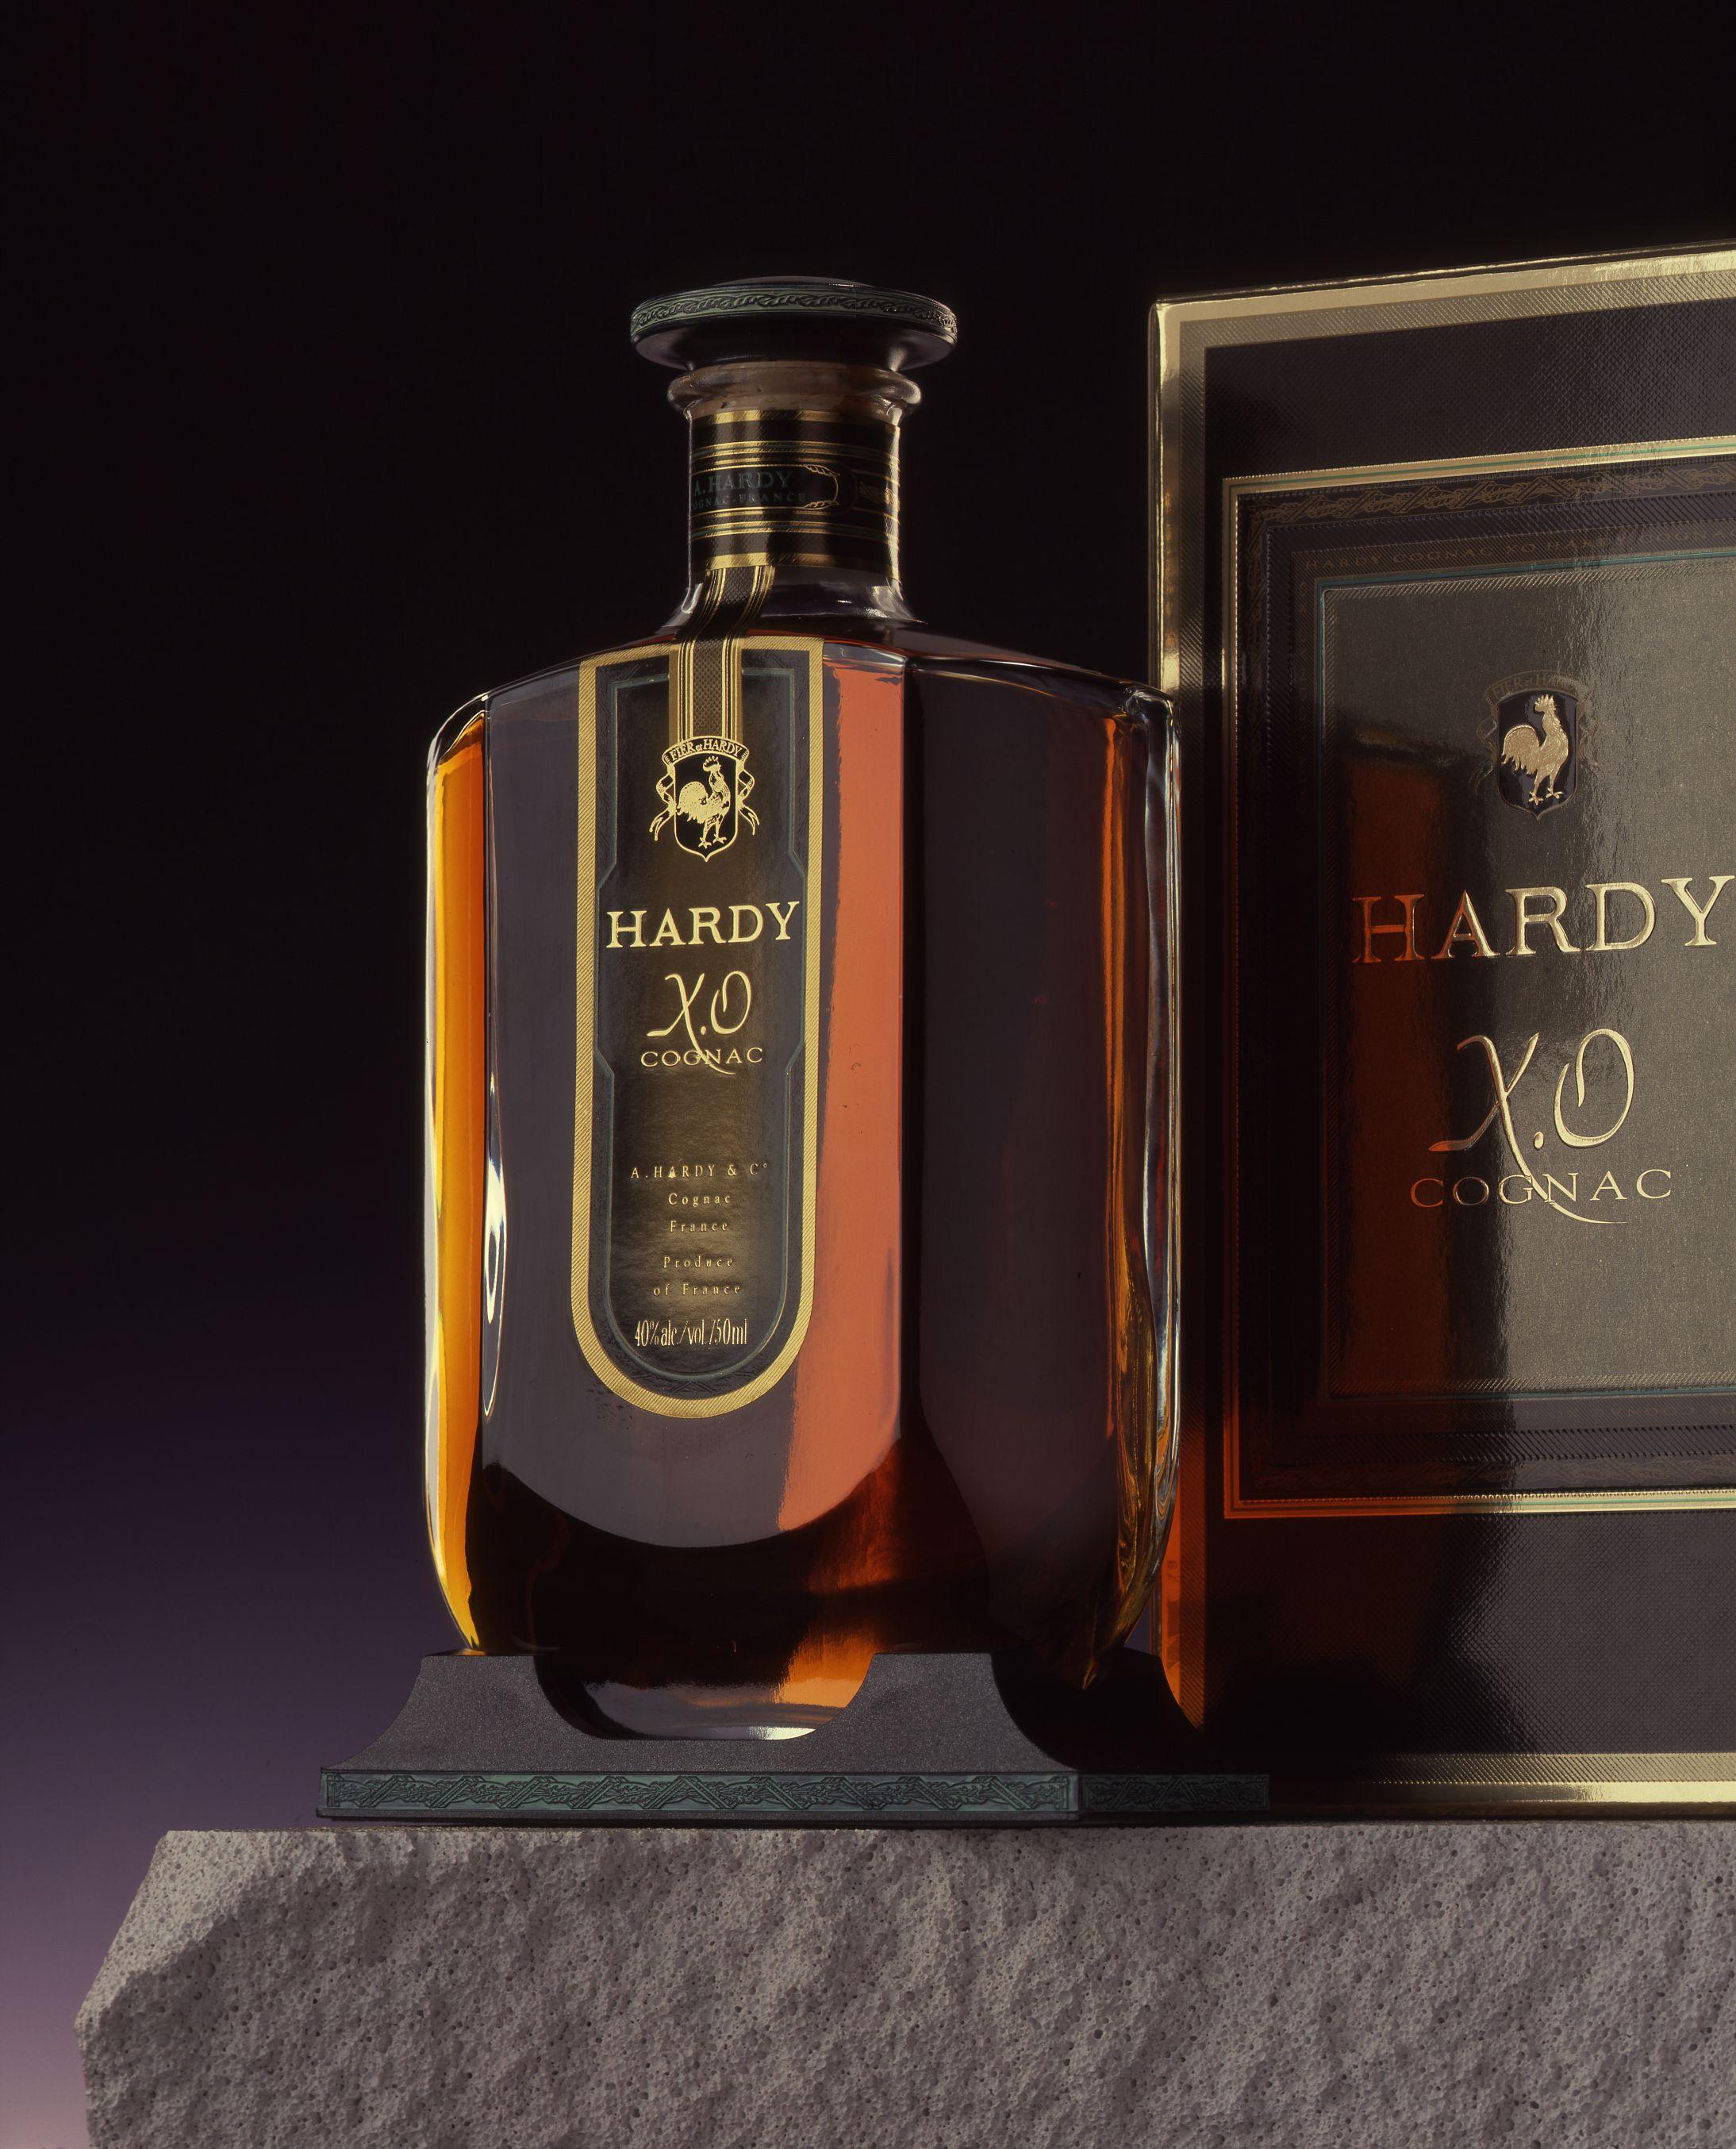 Cognac HARDY Classique XO Whisky drinks, Cognac drinks